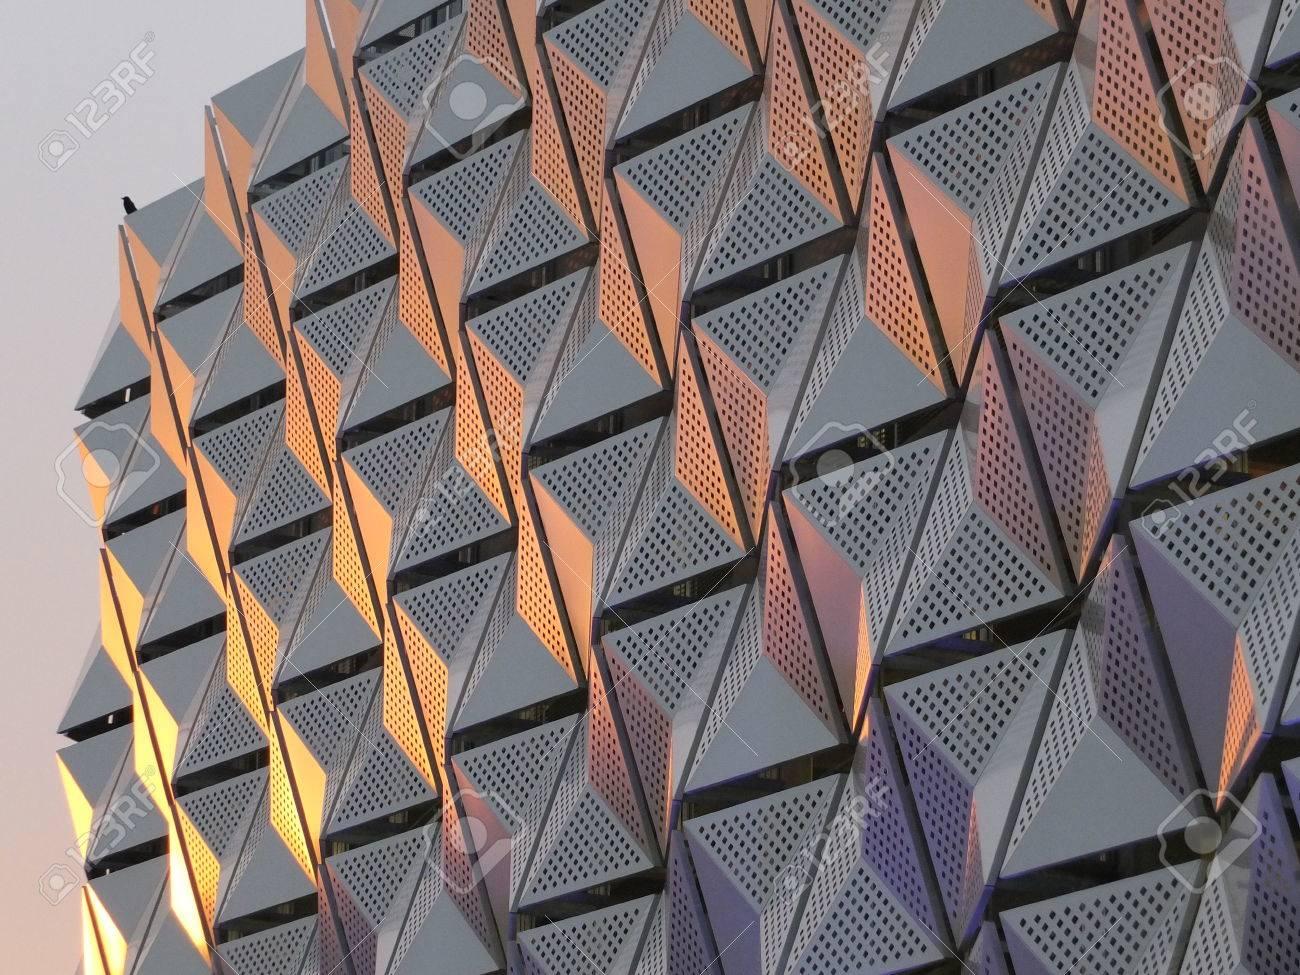 metal cladding on modern building